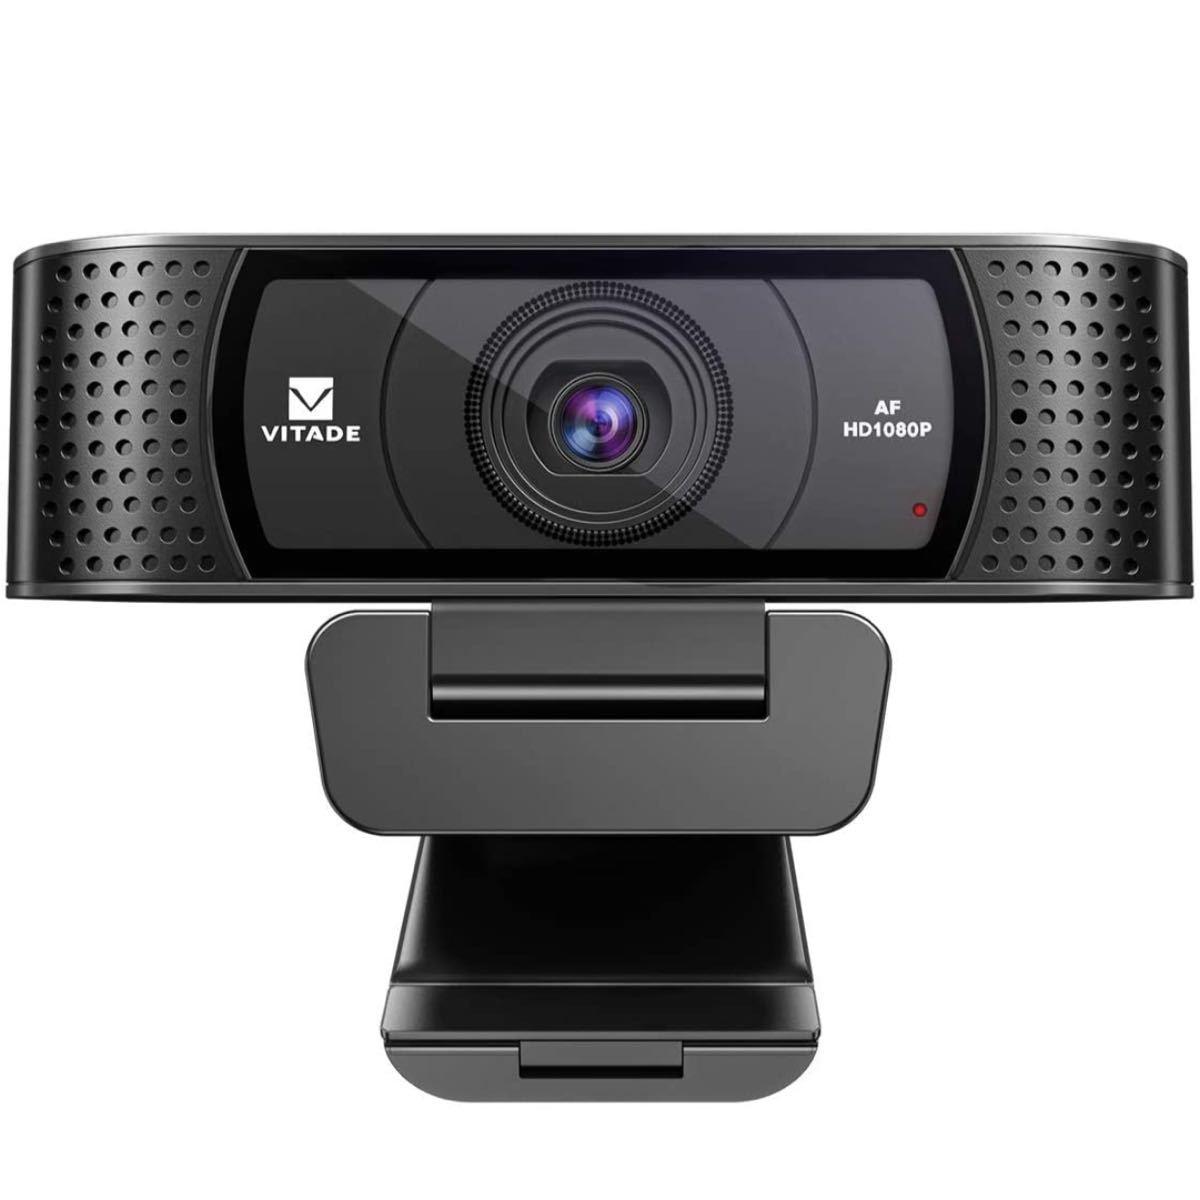 webウェブカメラ オートフォーカス マイク内蔵 広角90° フルHD  高画質